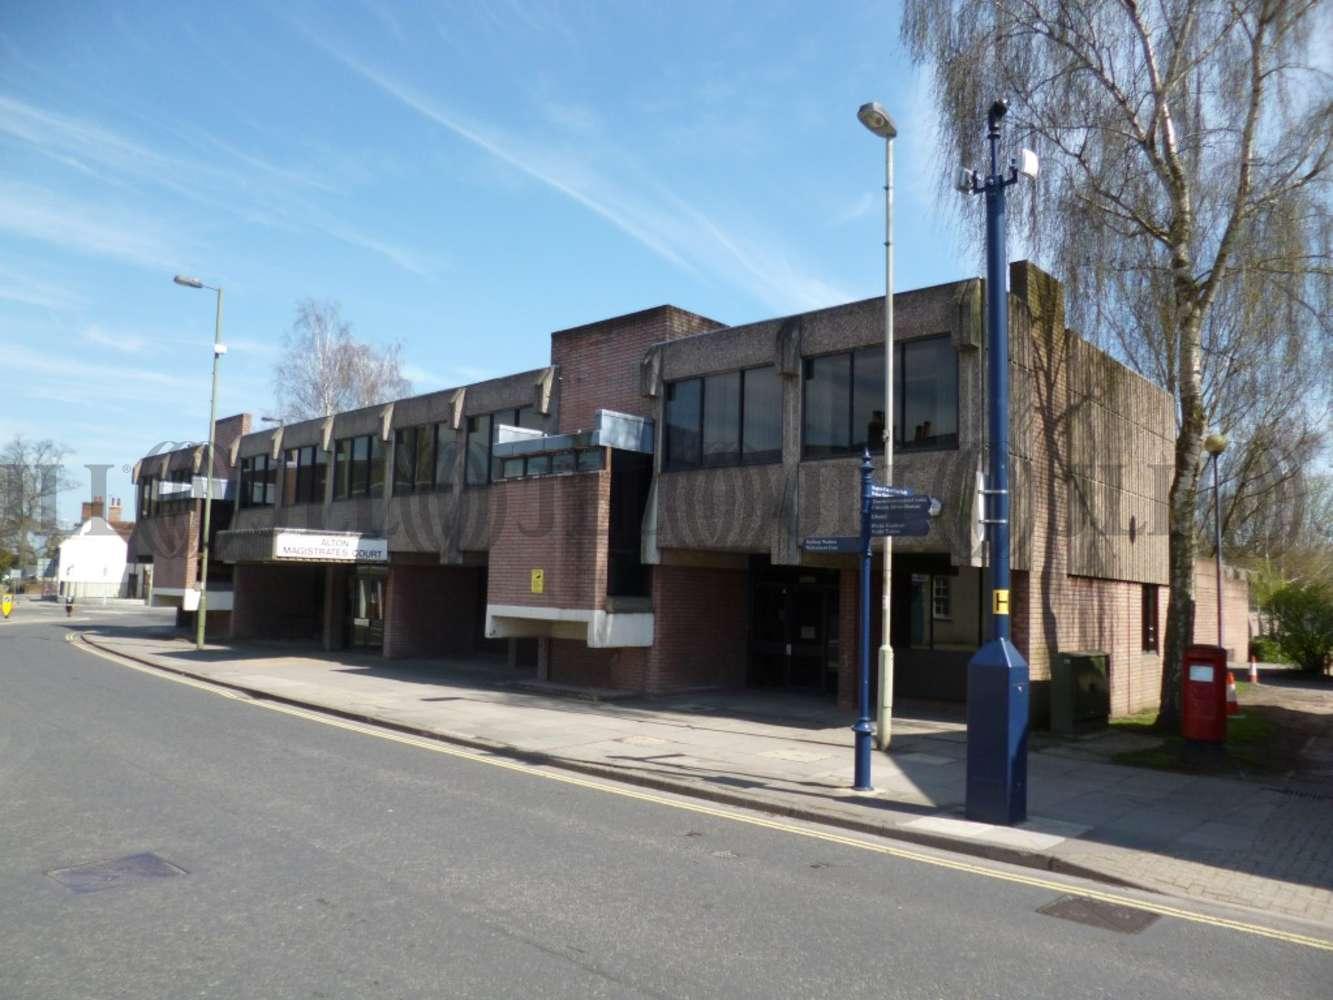 Land Alton, GU34 1DQ - Alton Magistrates Court and Police Station